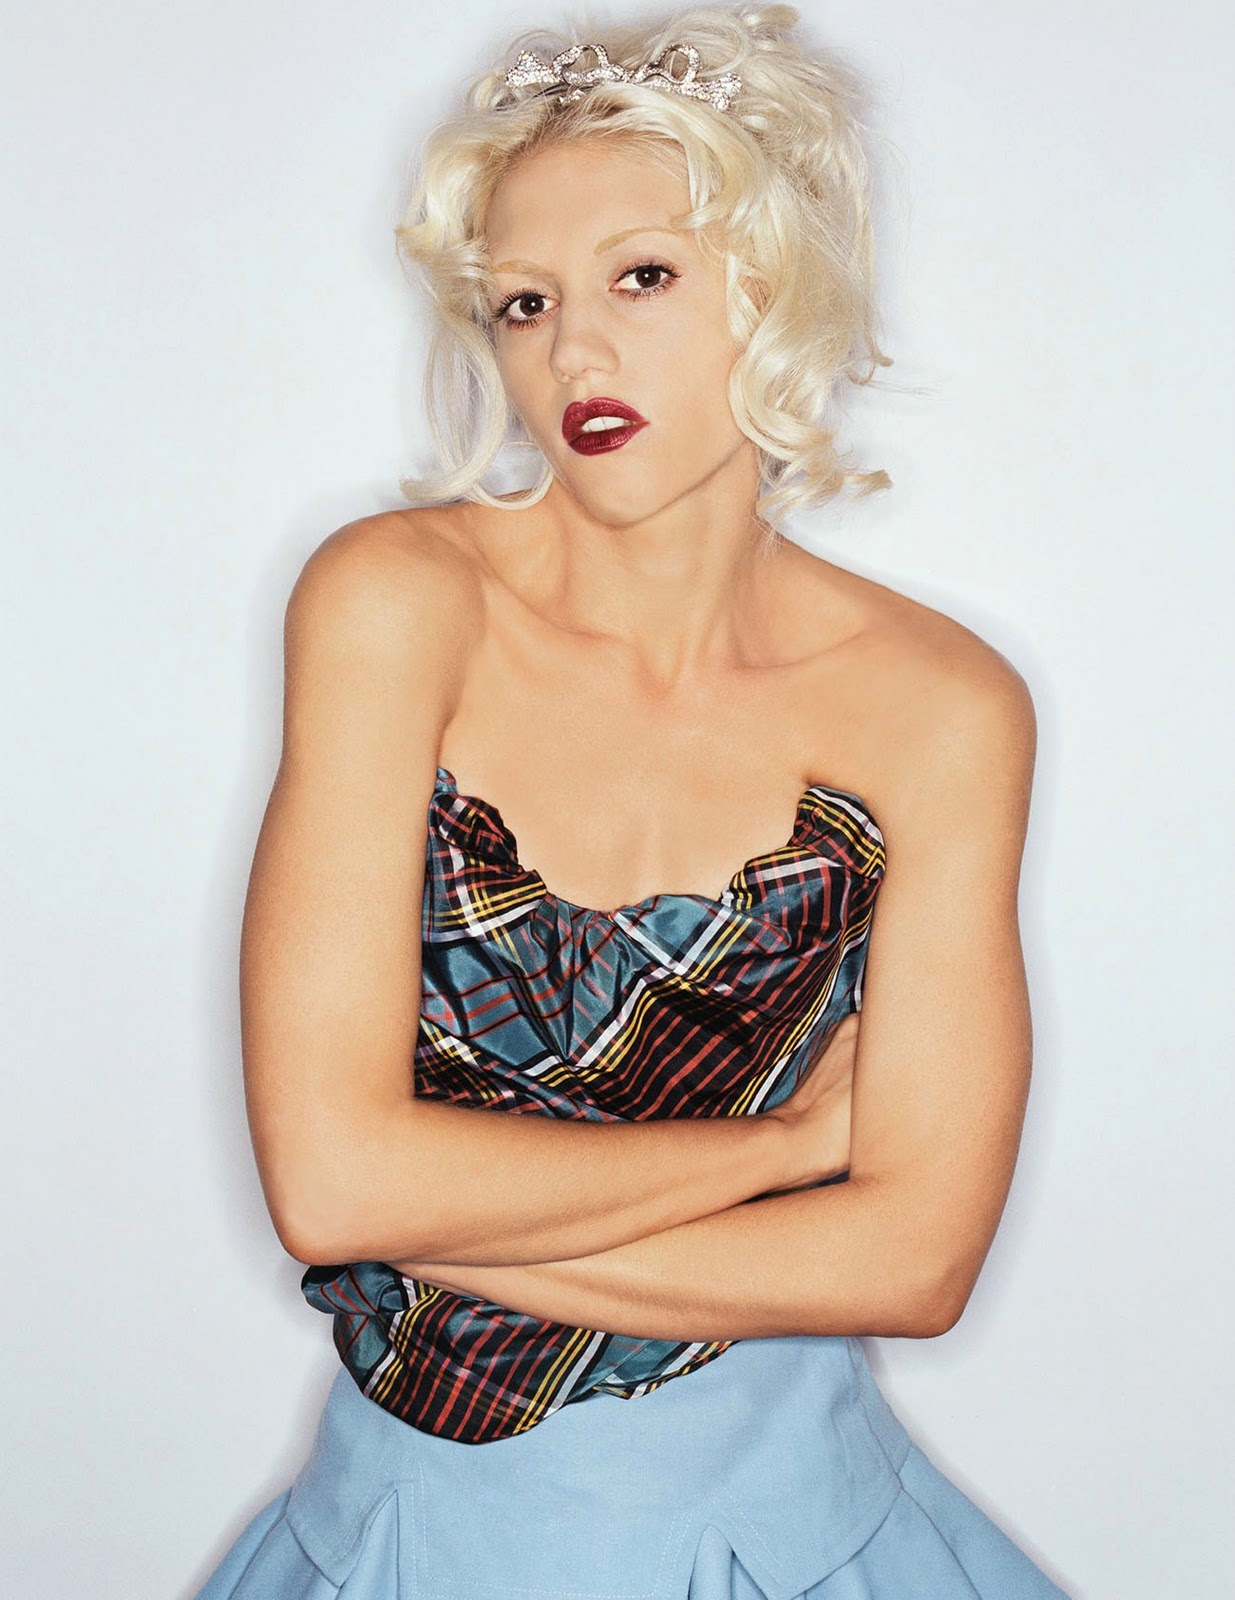 Hollywood Actress Gwen Stefani Cute Pics  Hot Celebrity -5699